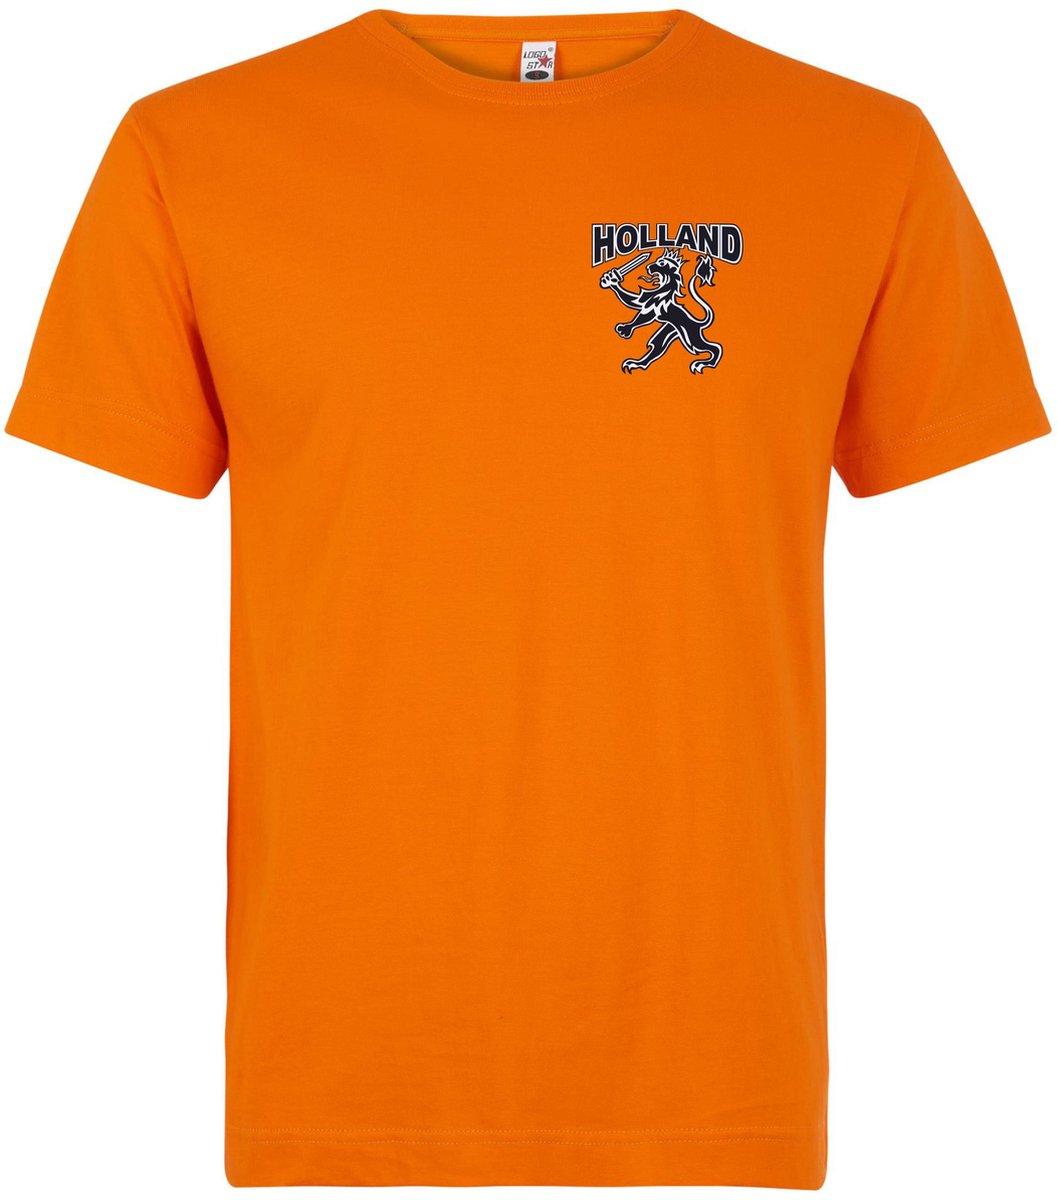 T-shirt oranje Holland WEGDORST 19   EK Voetbal 2020 2021   Nederlands elftal shirt   Nederland supp